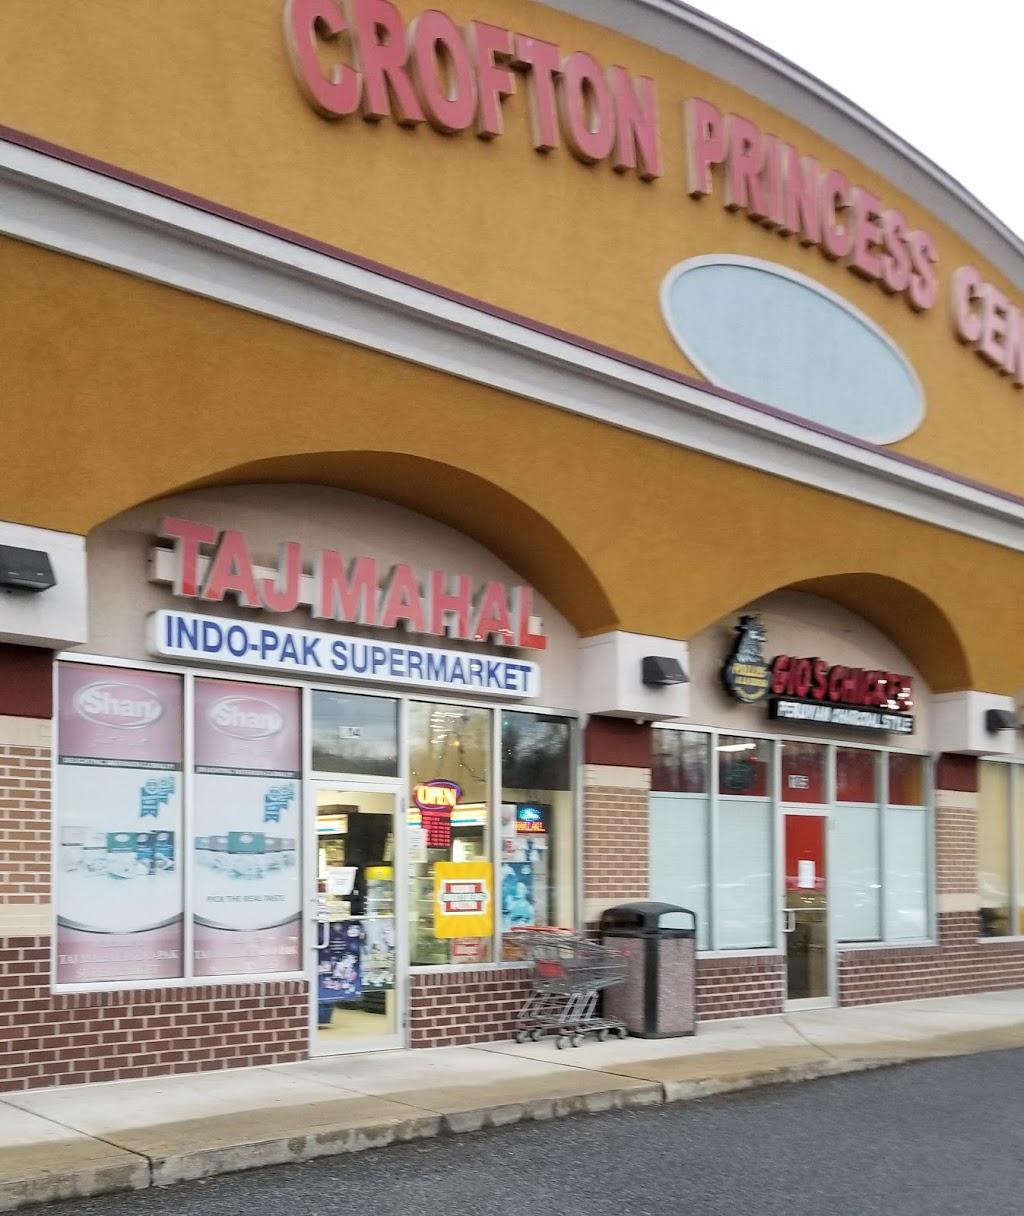 Taj Mahal Indo-Pak Supermarket - supermarket  | Photo 3 of 6 | Address: 2510 Conway Rd #104, Gambrills, MD 21054, USA | Phone: (410) 721-7161